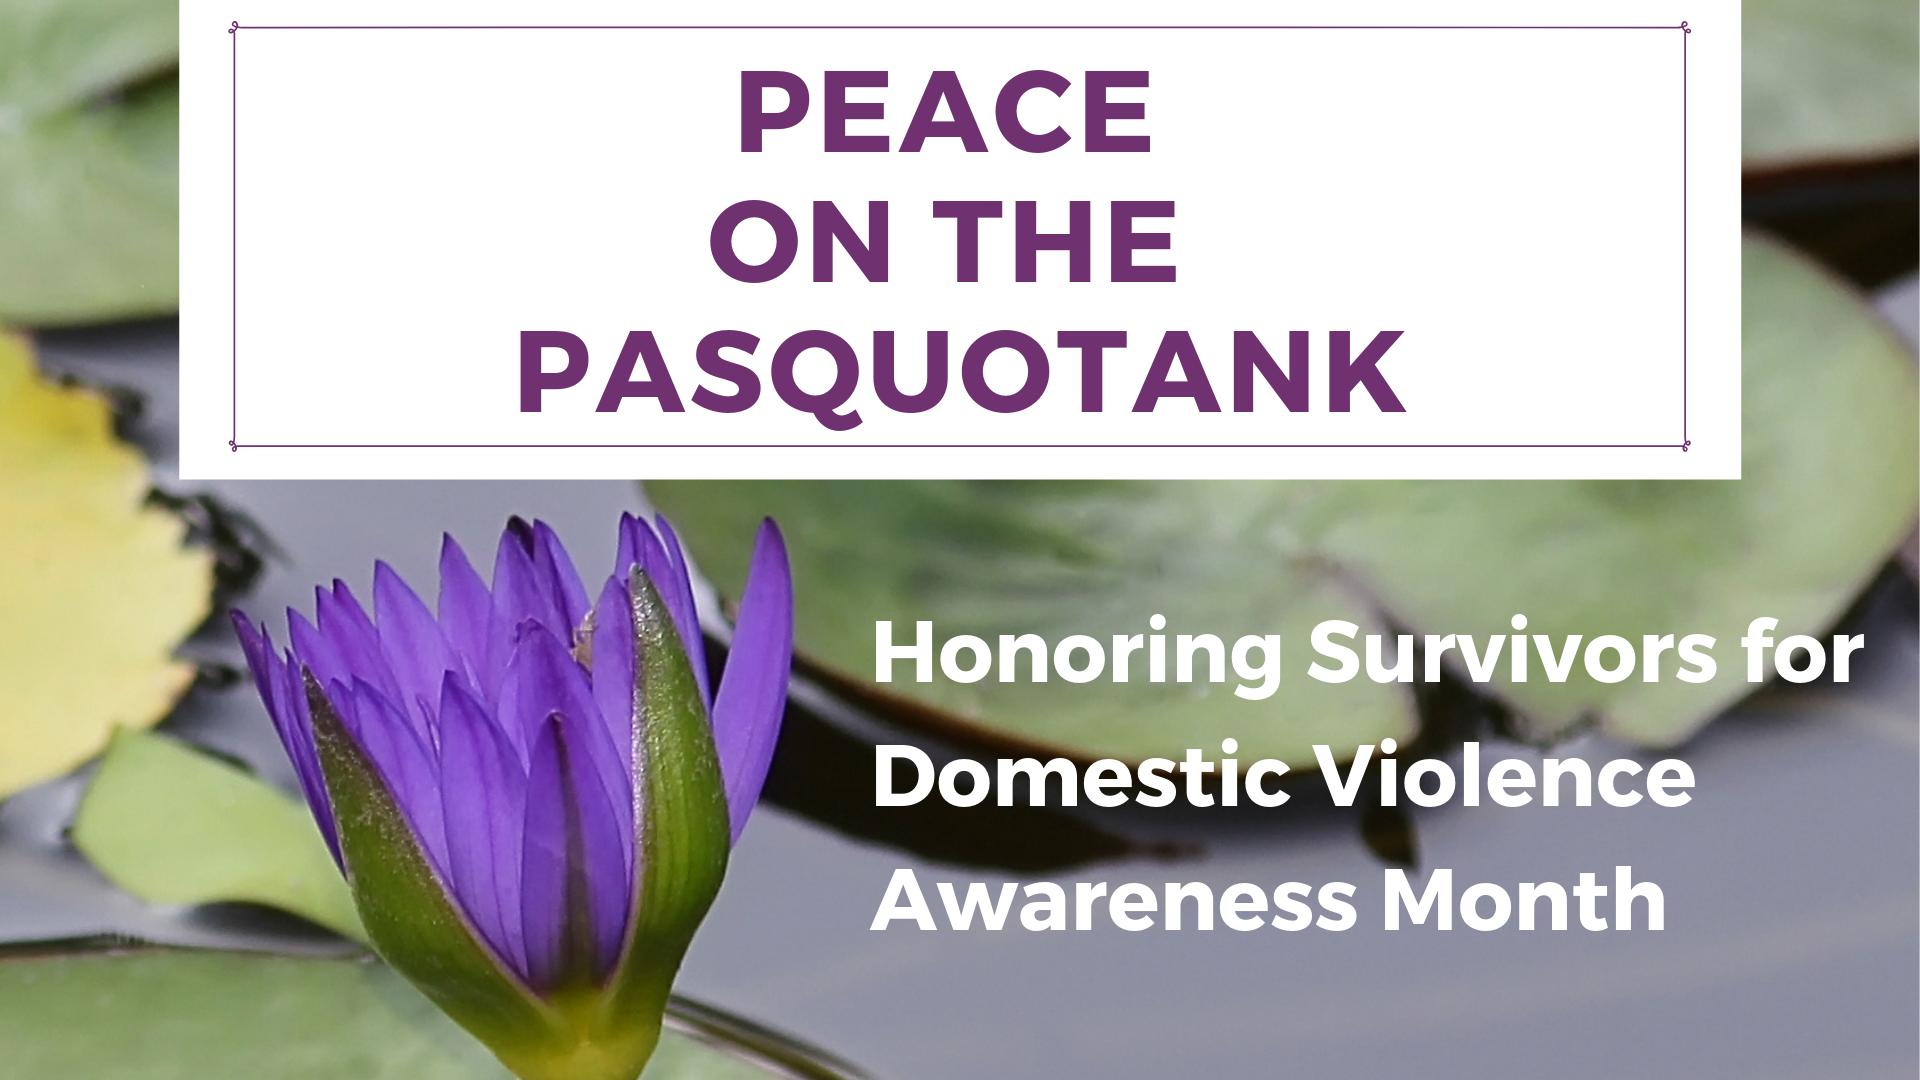 Peace on the Pasquotank